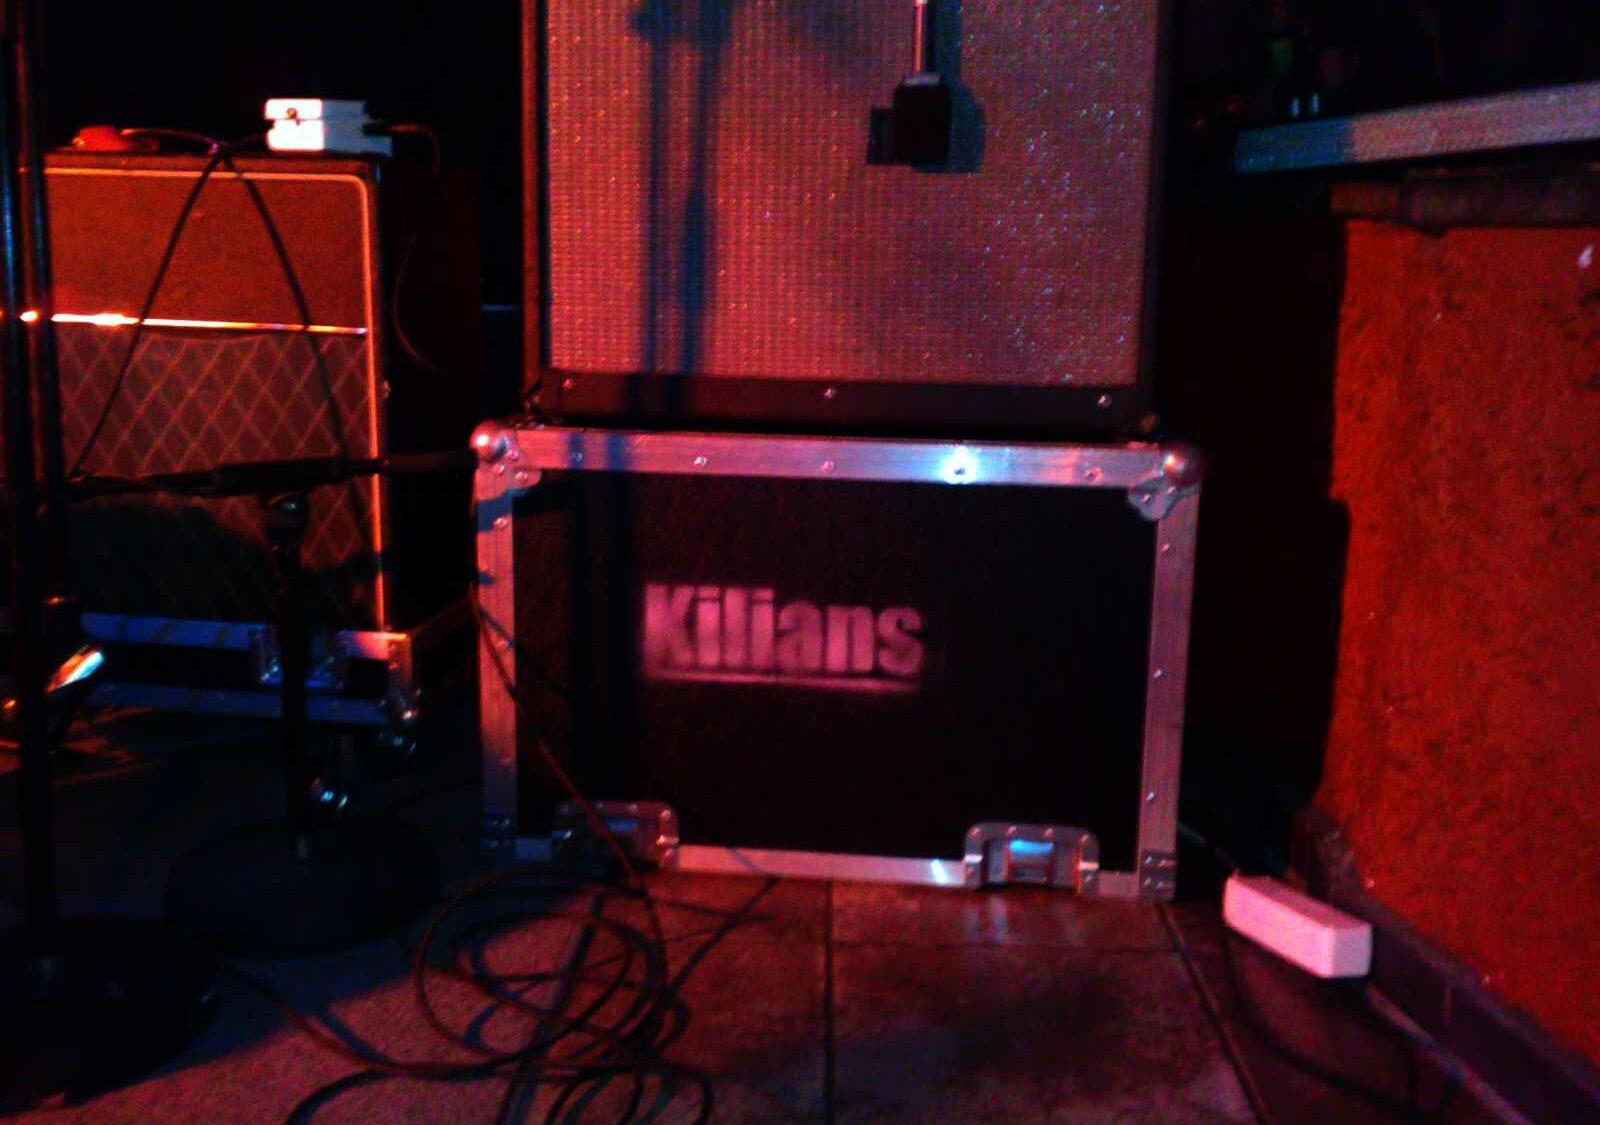 The Killians in Koblenz 2008